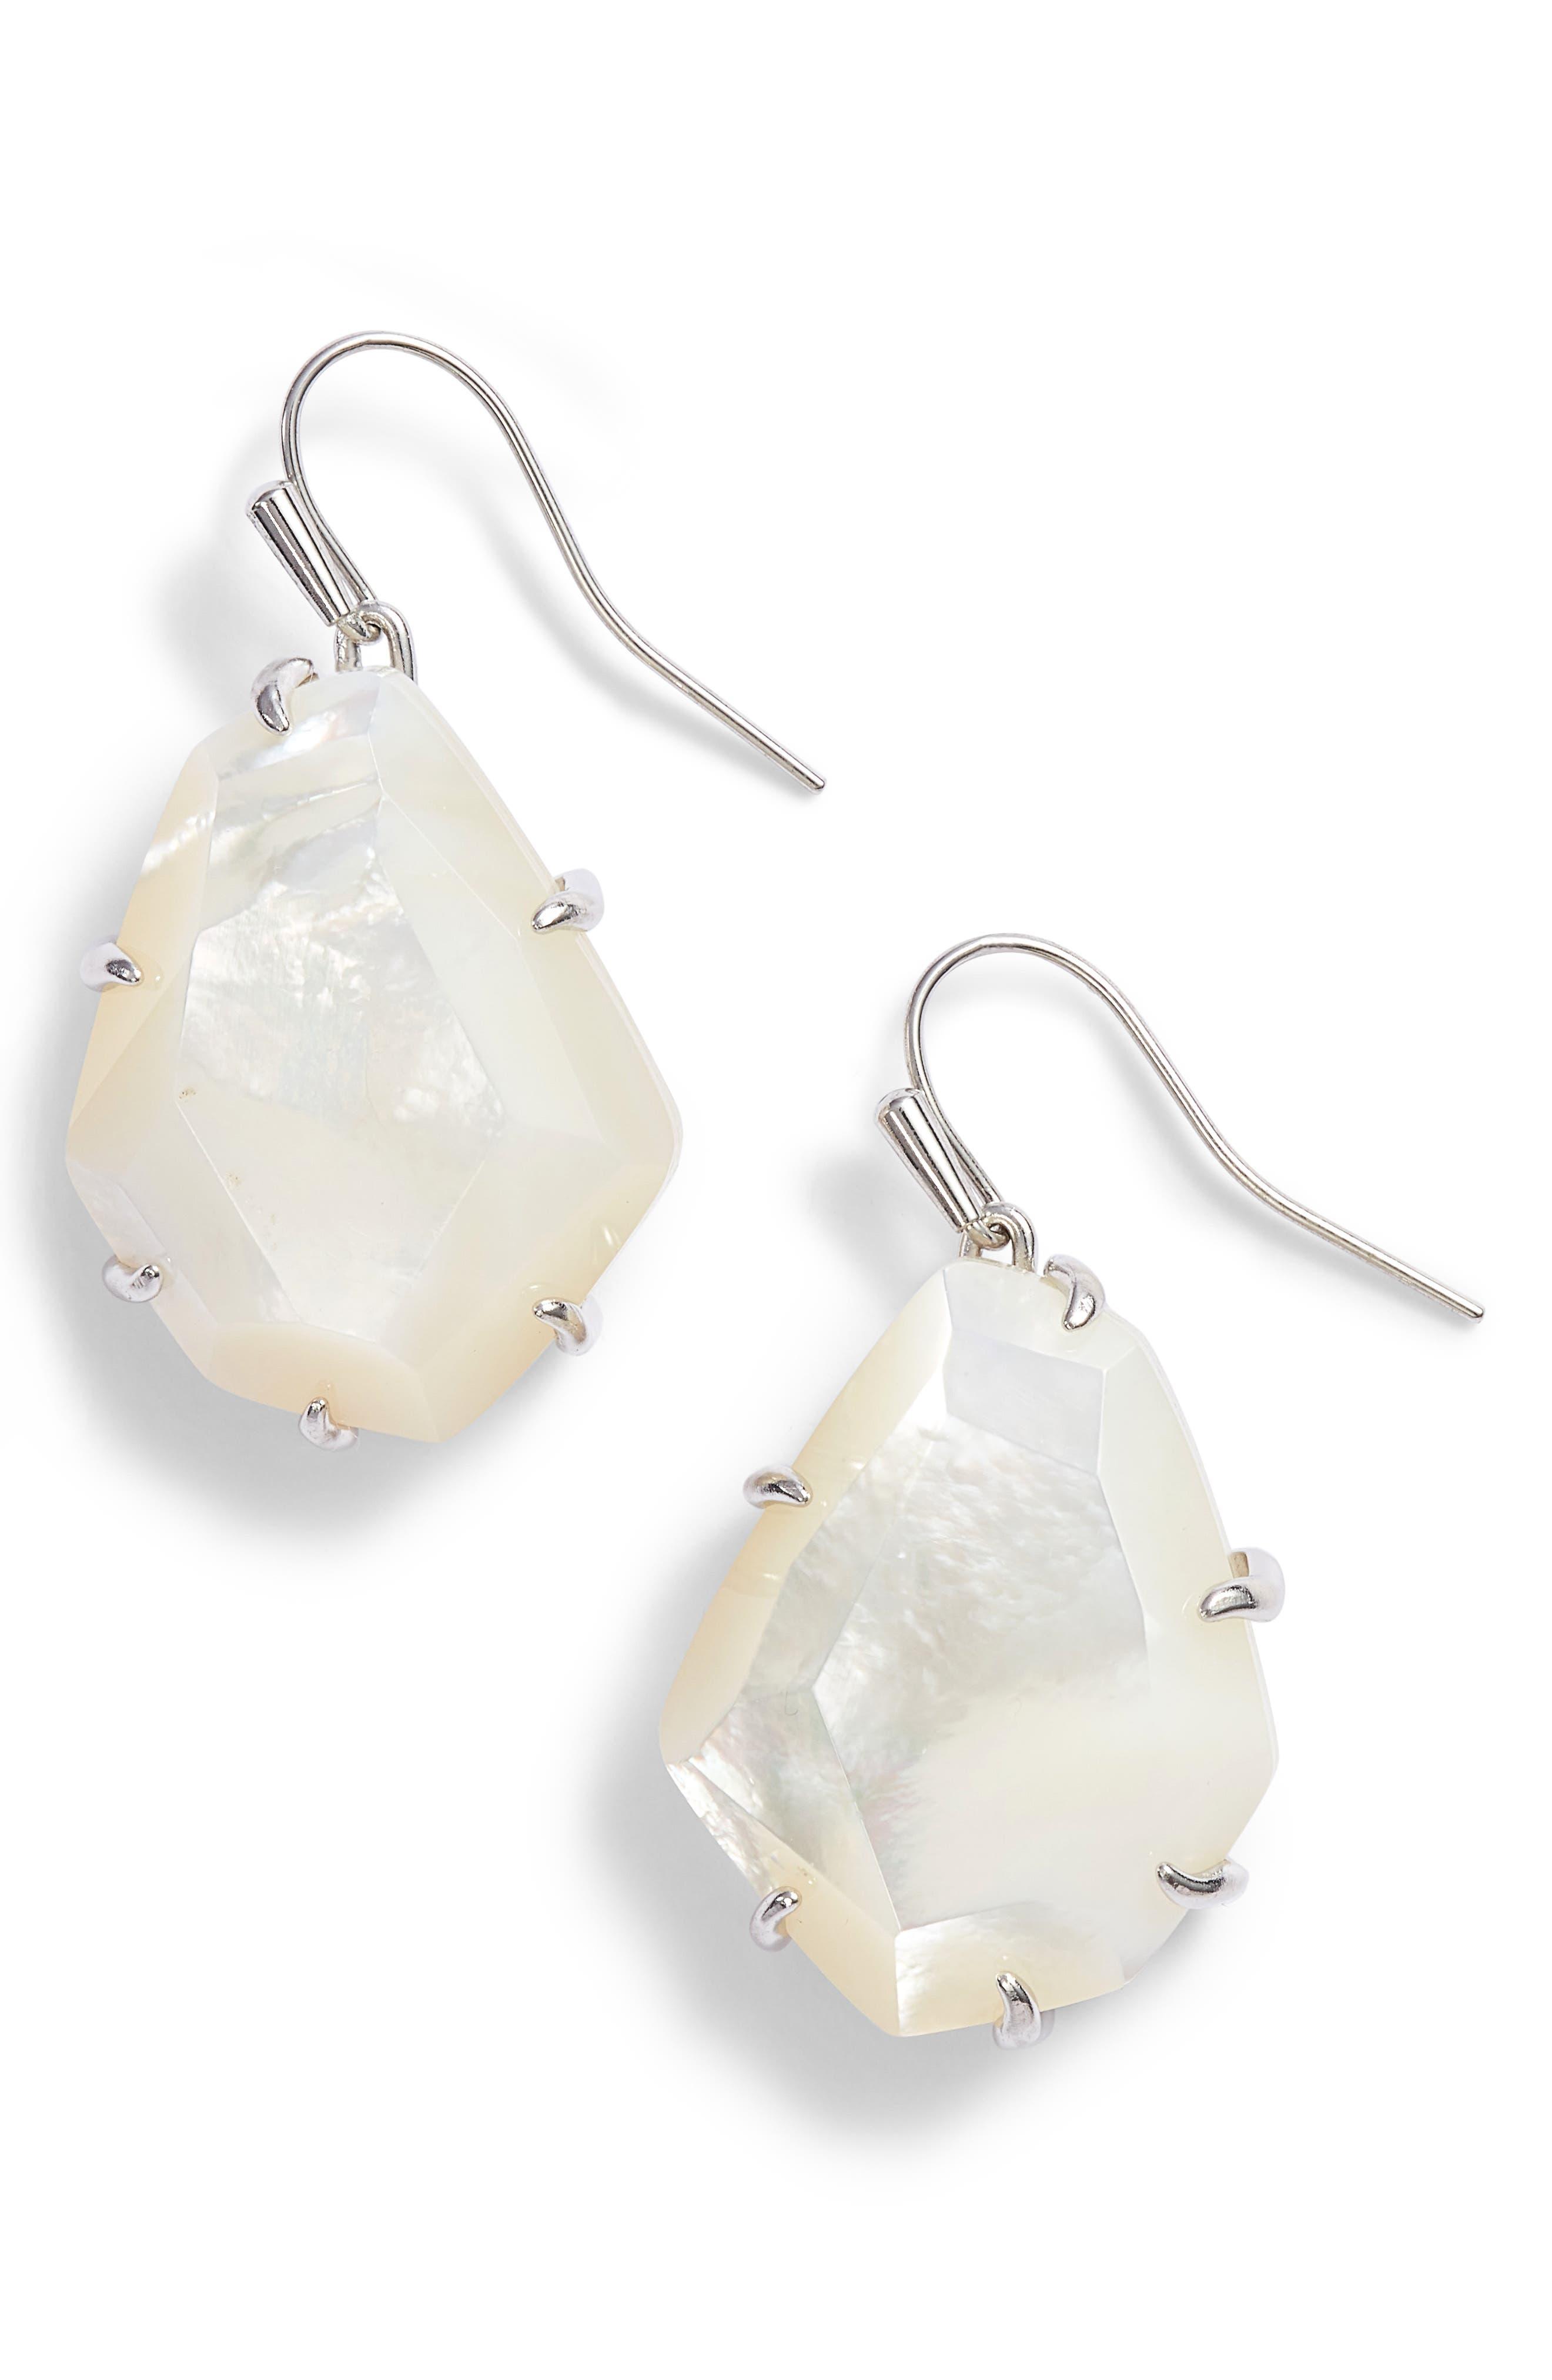 Rosenell Stone Earrings,                             Main thumbnail 1, color,                             100